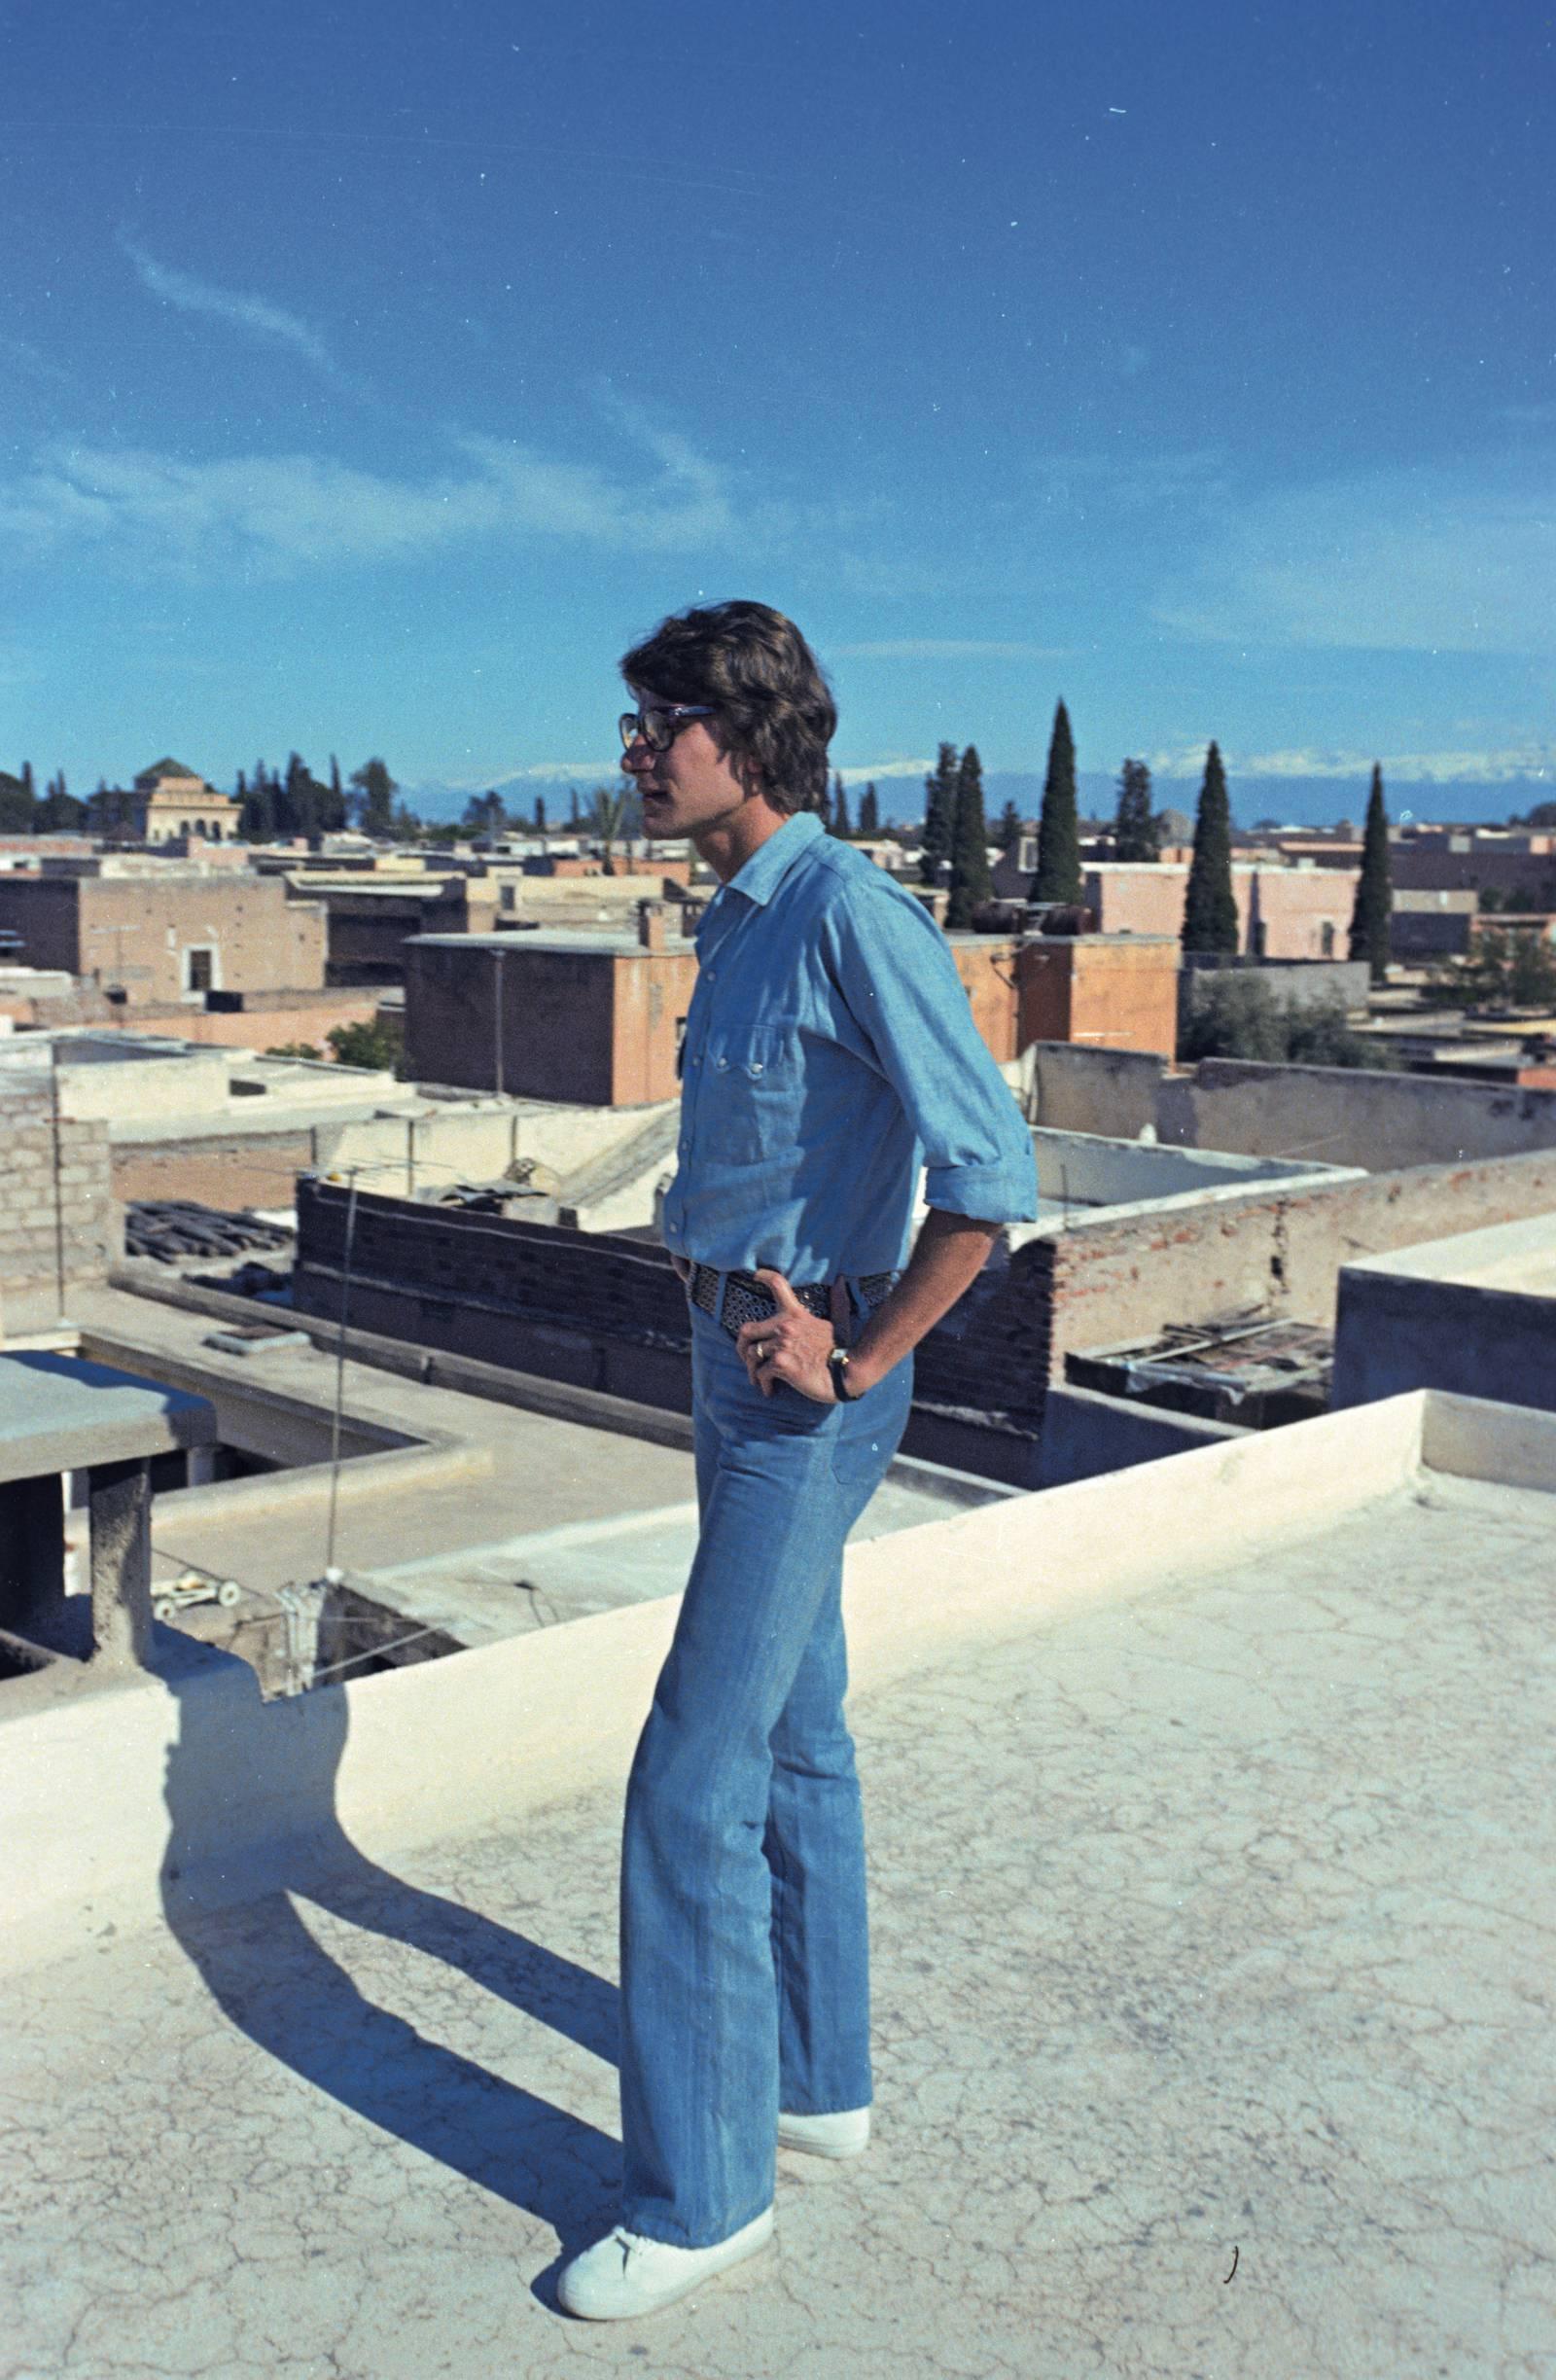 4a7b5310e56 Moroccan Love Affair | Exploring Yves Saint Laurent's Love Affair with  Morocco - Amuse